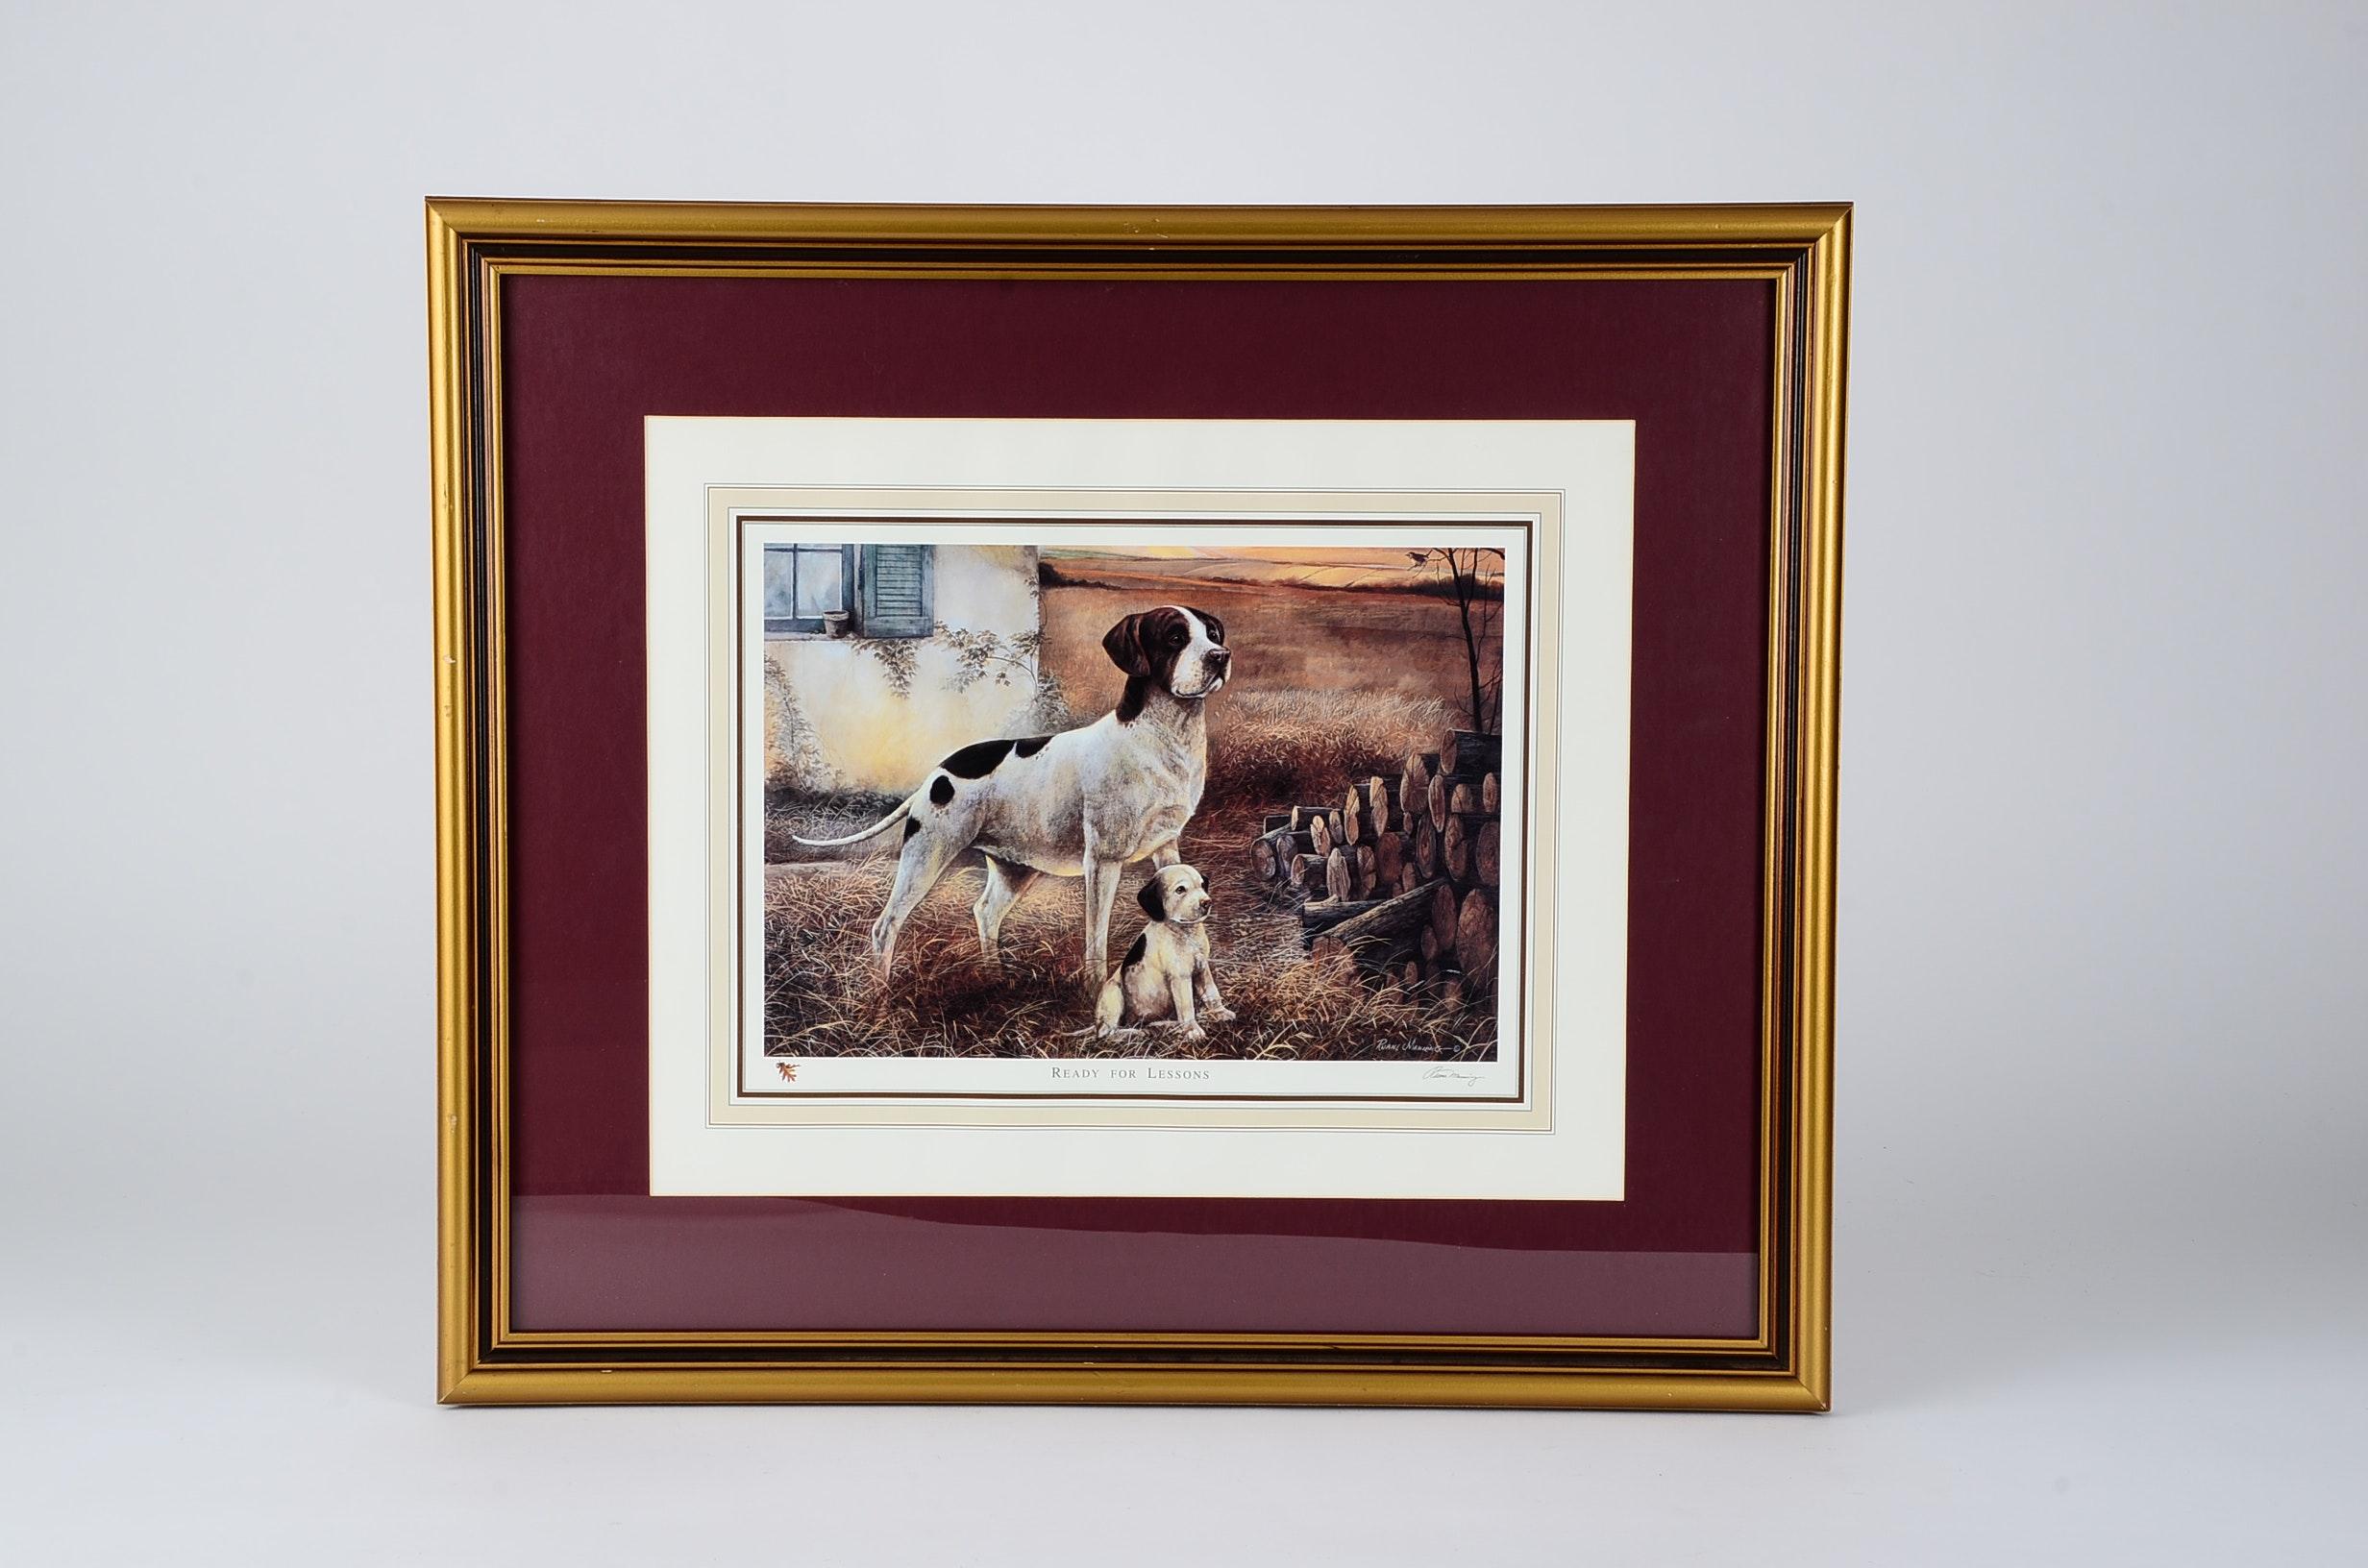 Framed Dog Print